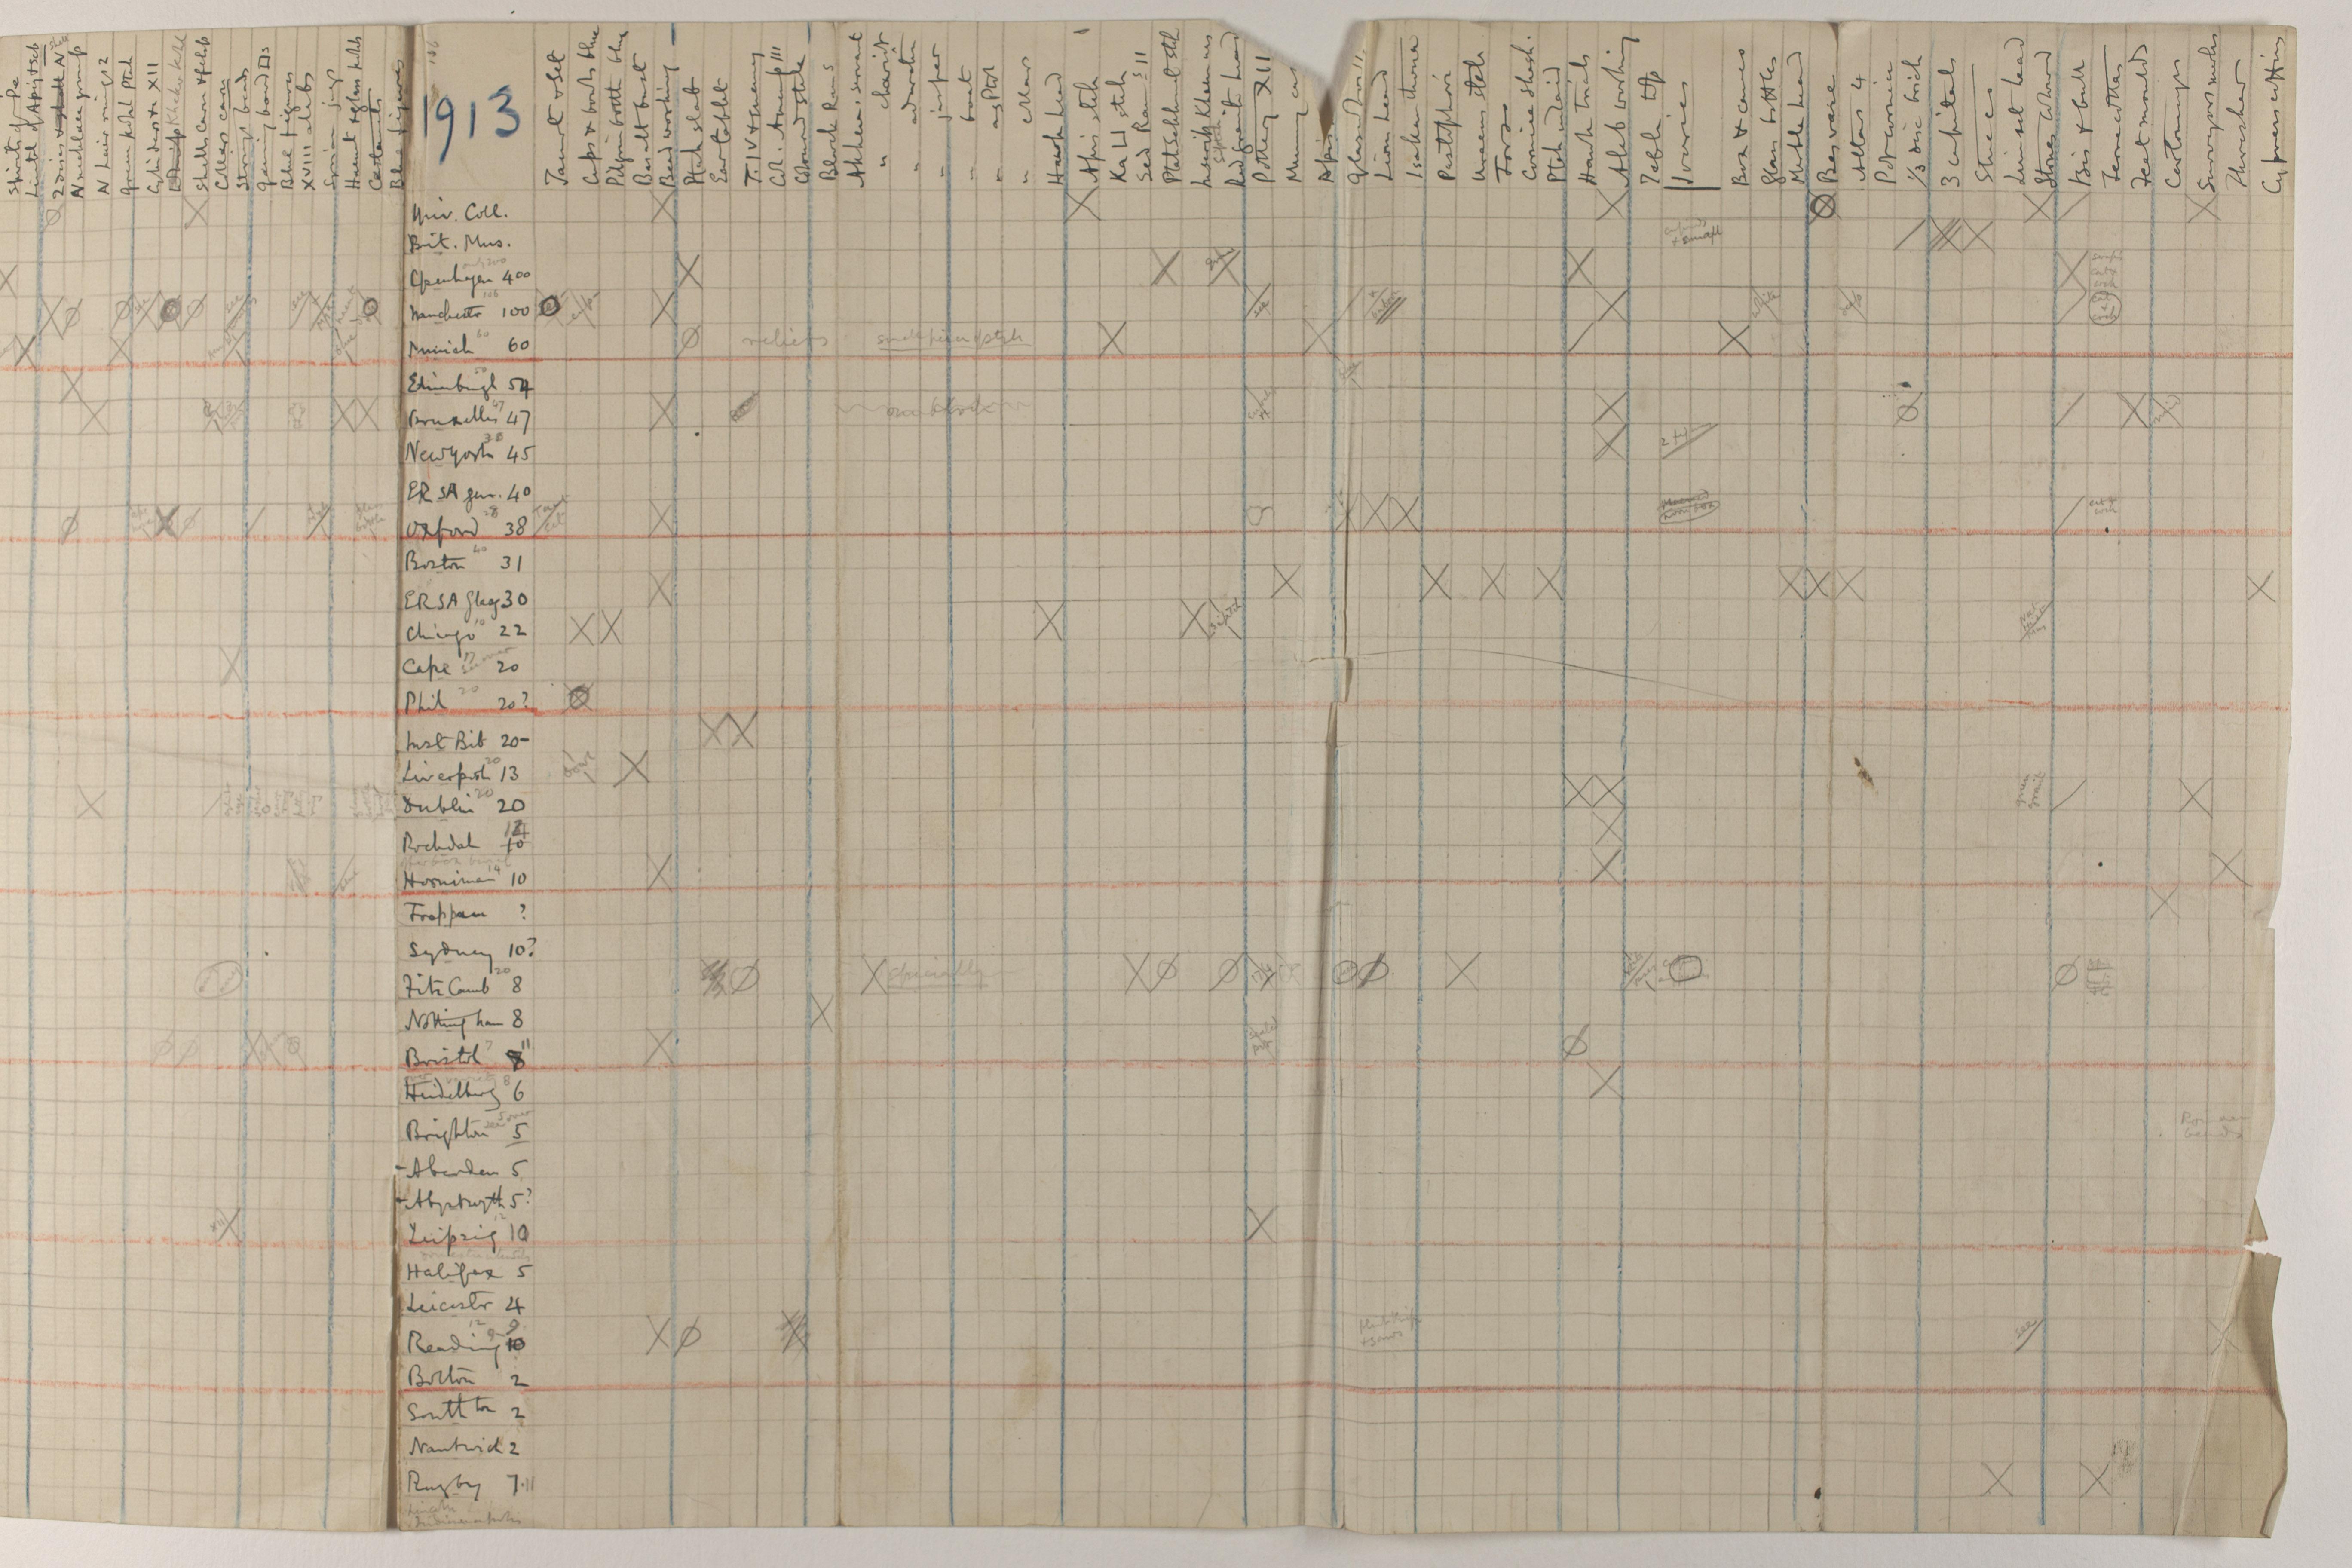 1912-13 Tarkhan, el-Riqqa, Memphis Multiple institution list PMA/WFP1/D/21/1.2